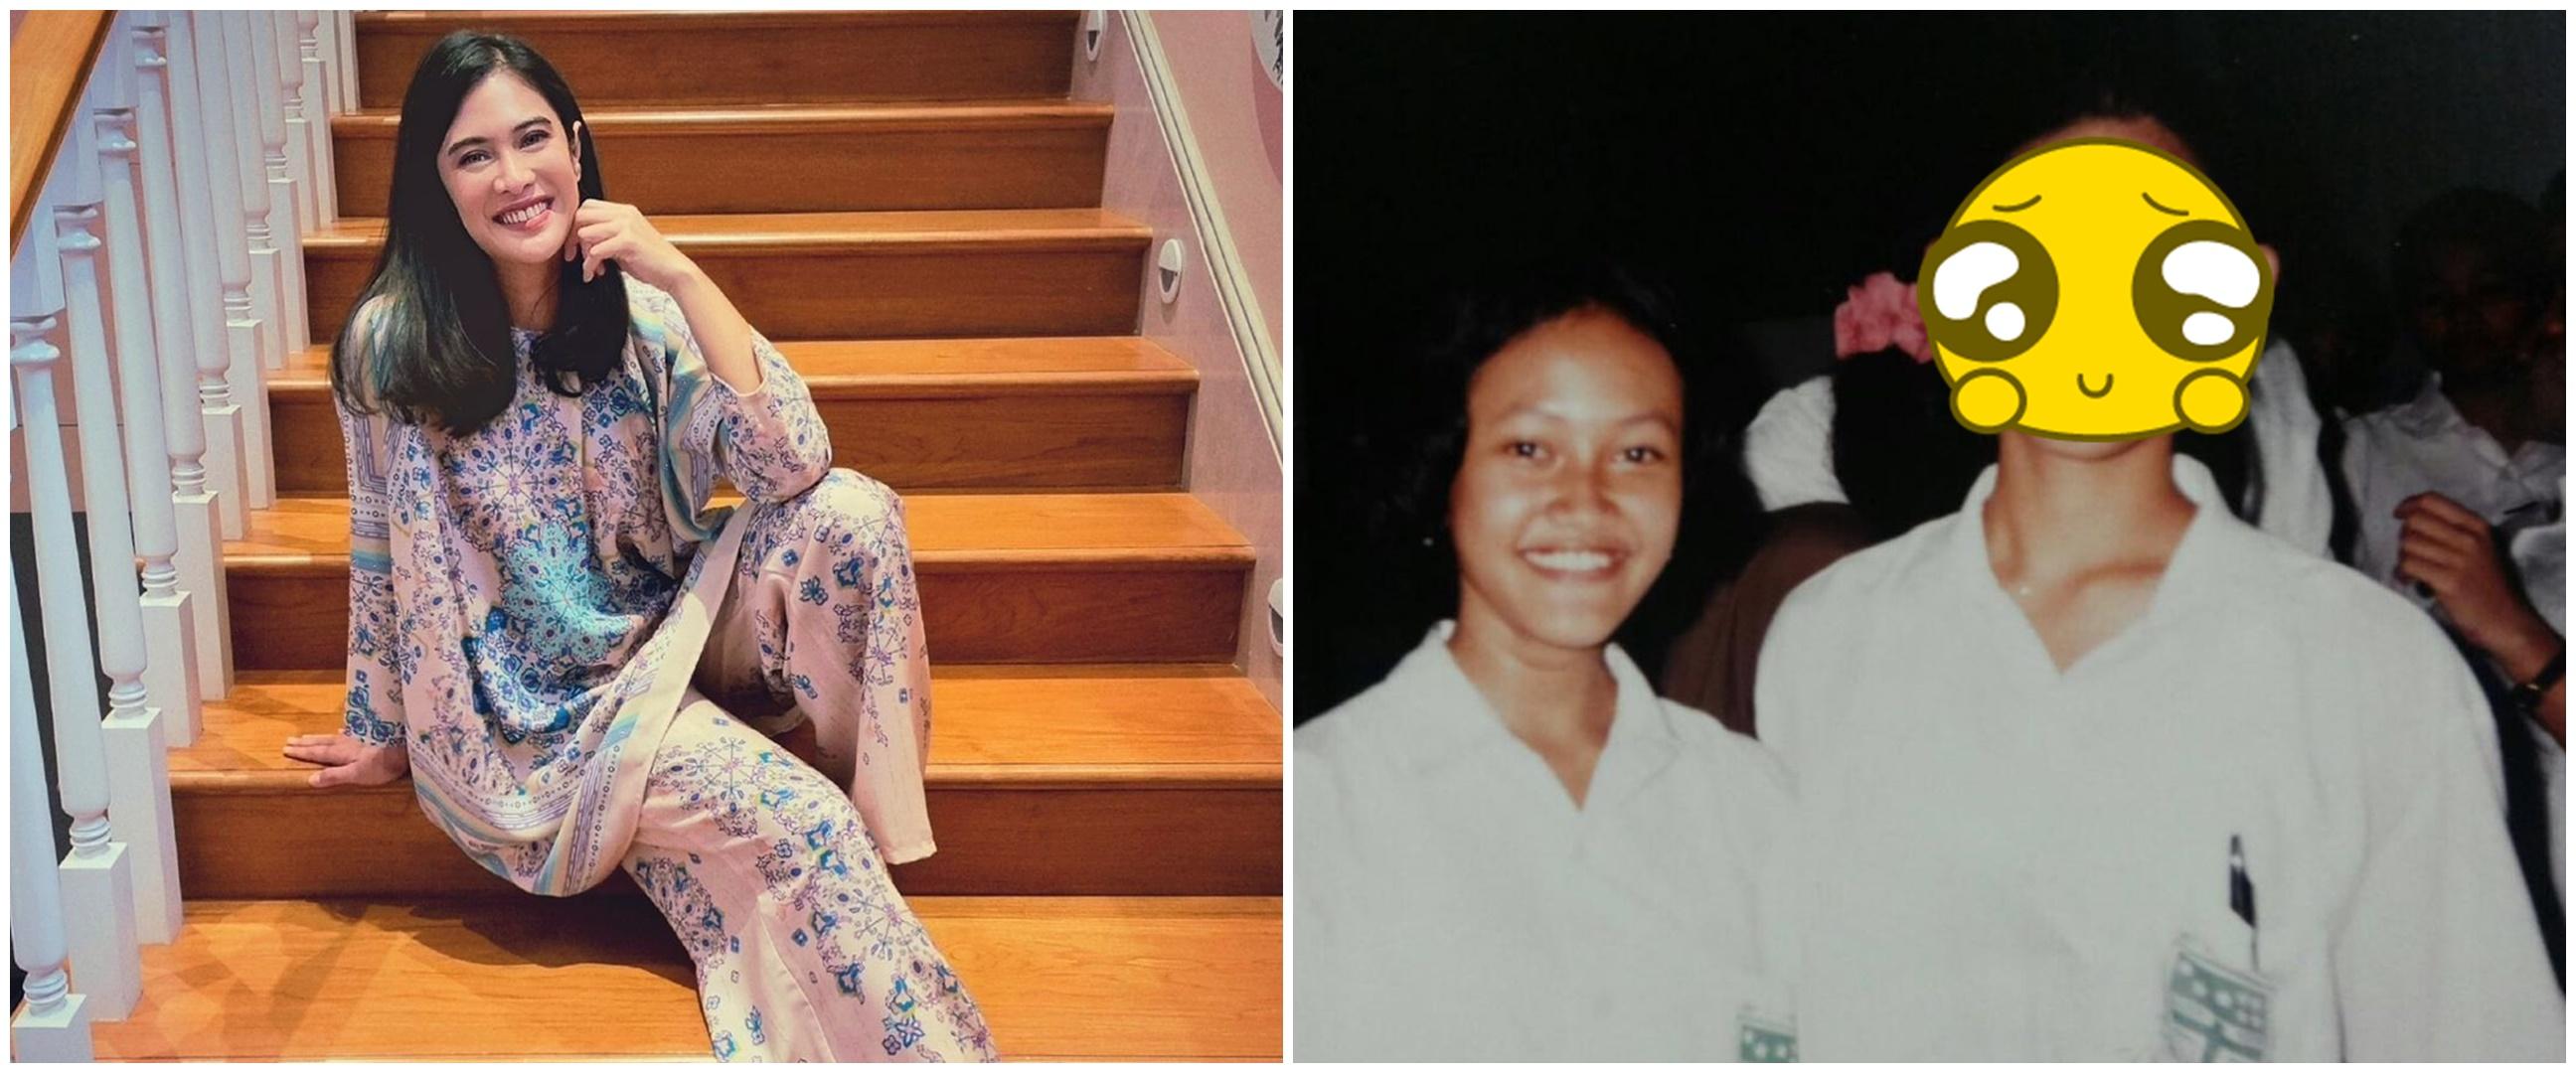 8 Potret lawas Dian Sastrowardoyo saat sekolah, bukti cantik dari dulu